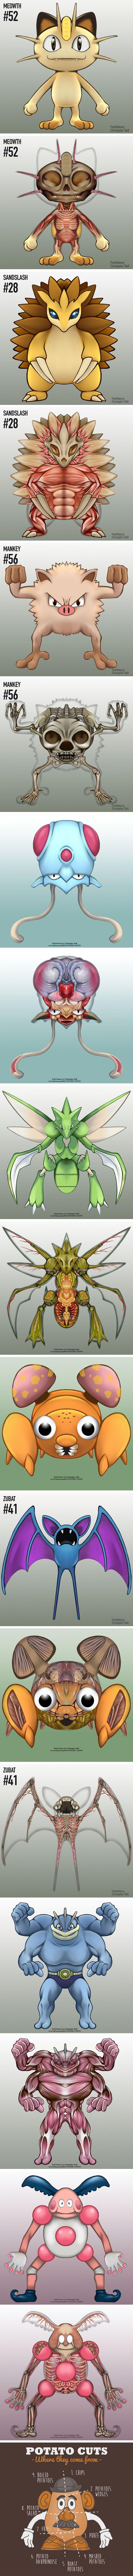 Illustrator Make Pokémon Anatomy To Help Kids Interested In Biology